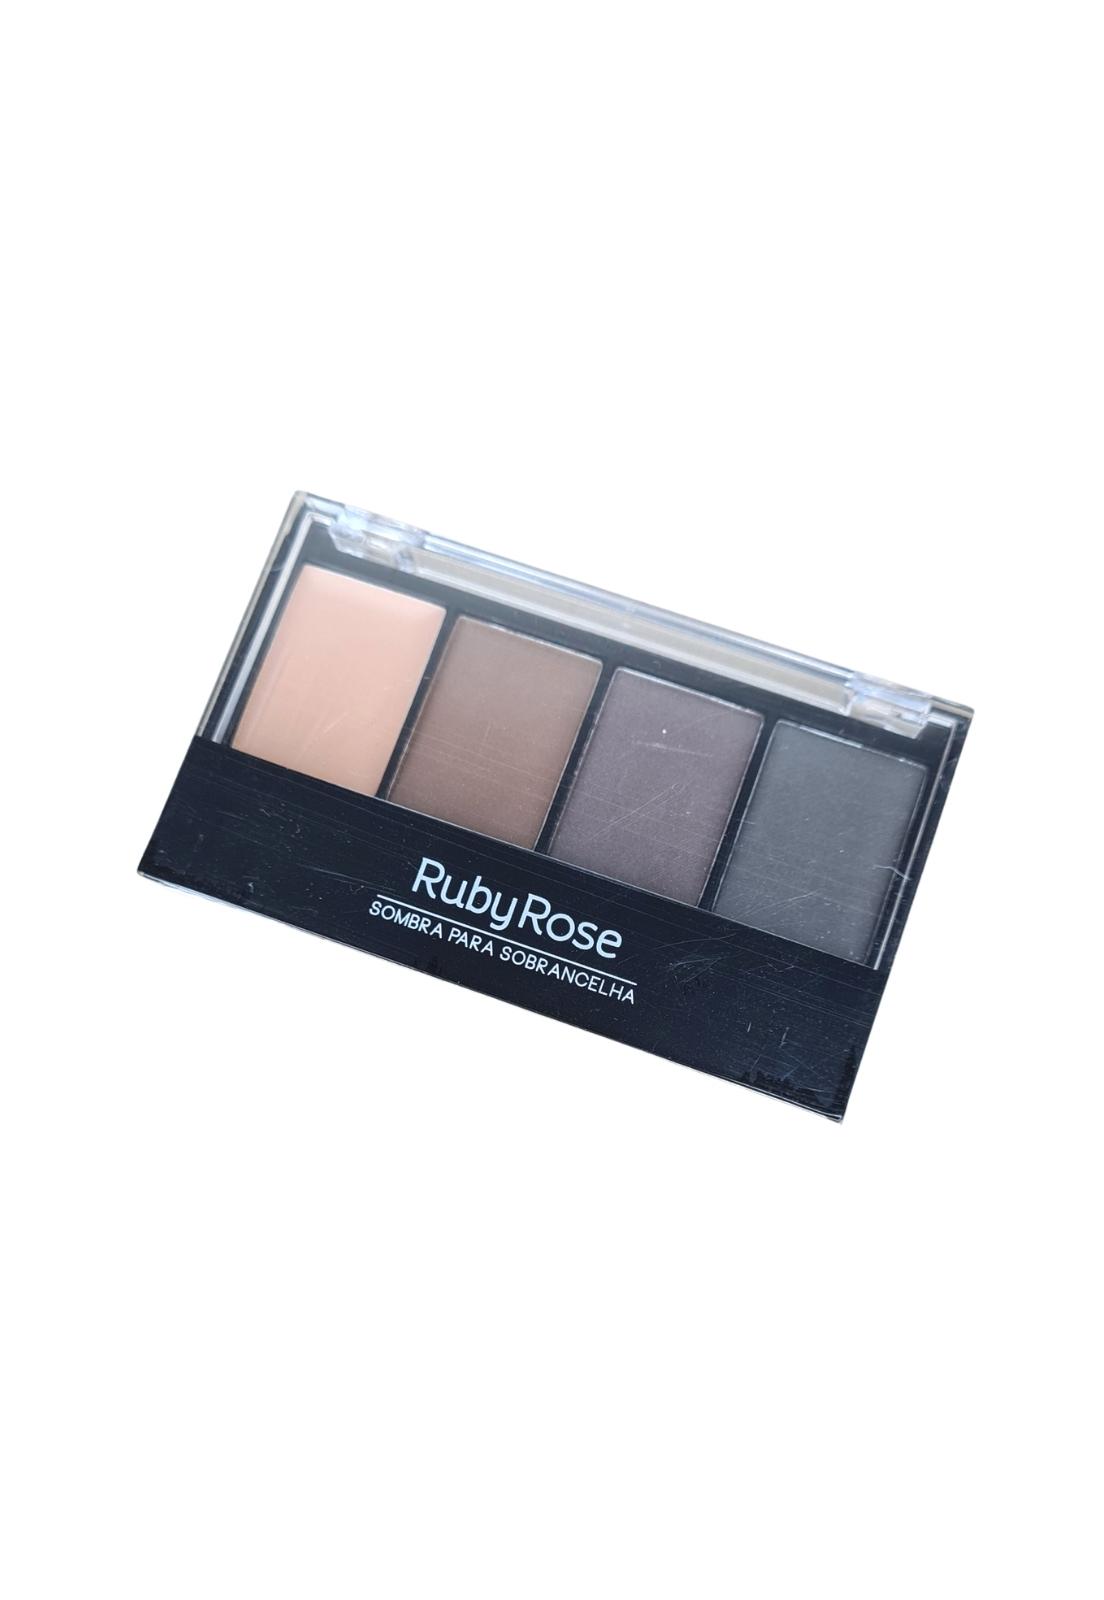 Paleta para sobrancelhas Ruby Rose HB-9354